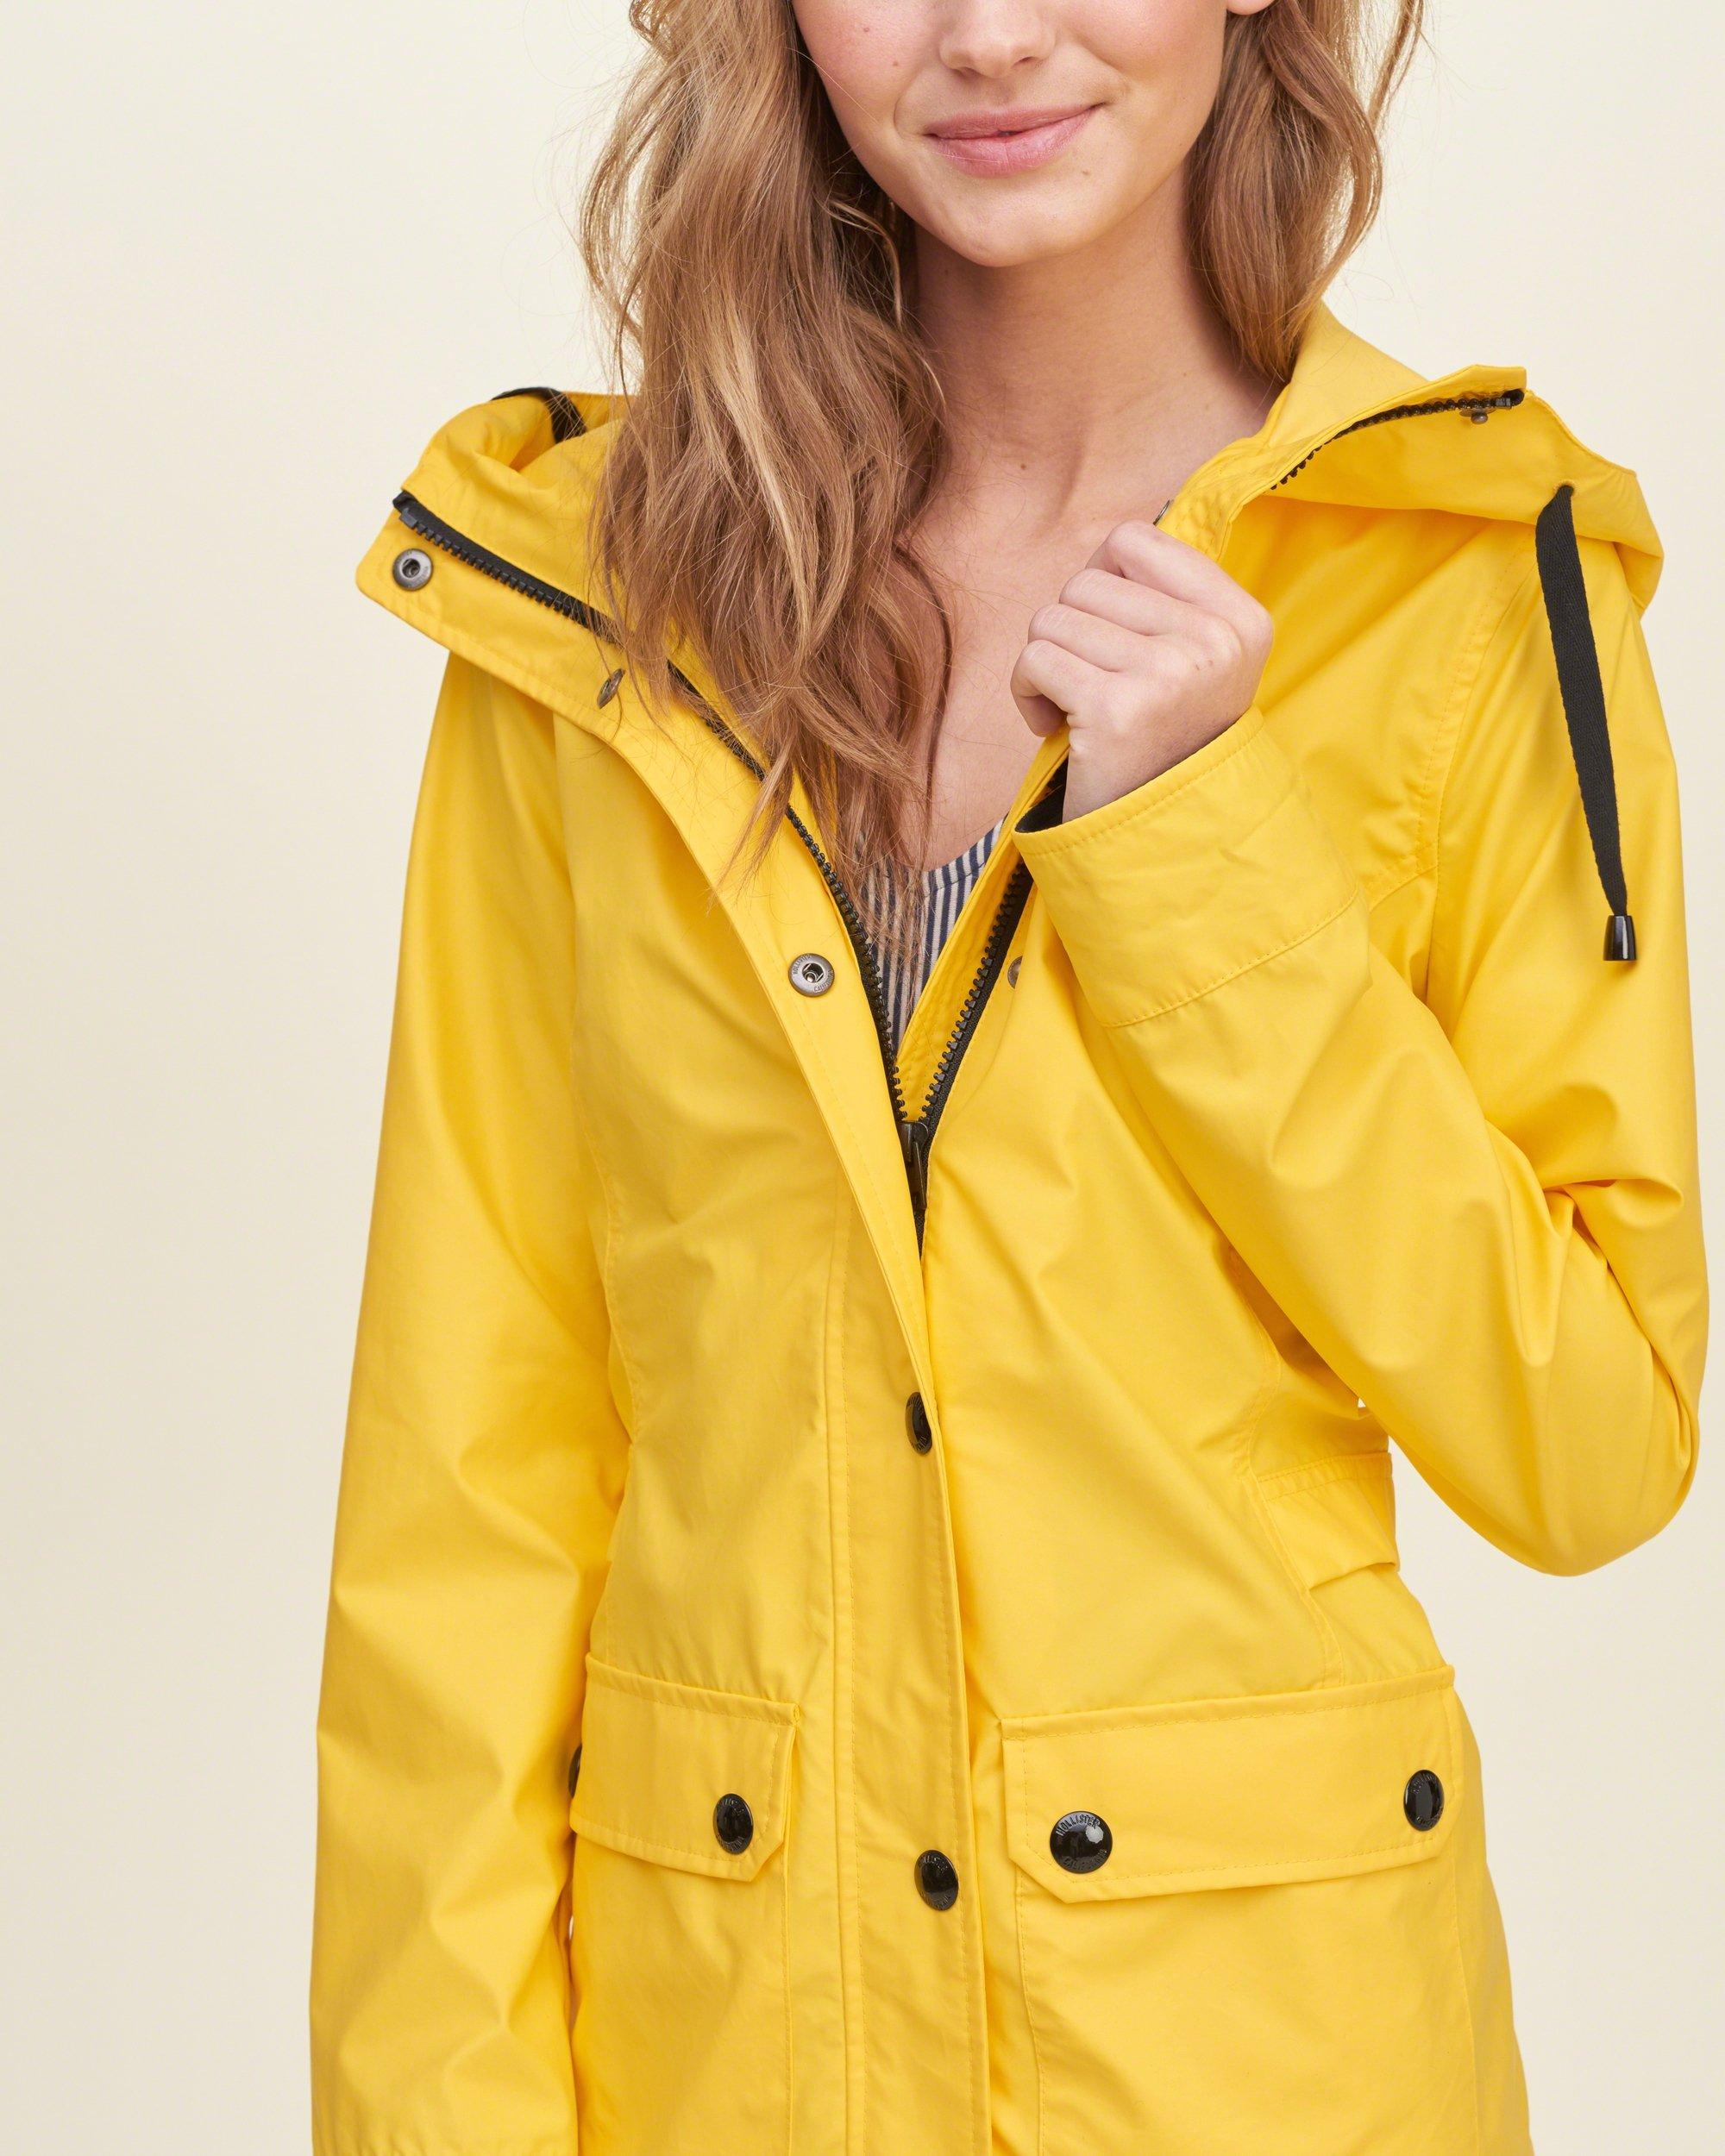 Yellow Rain Jacket Women S